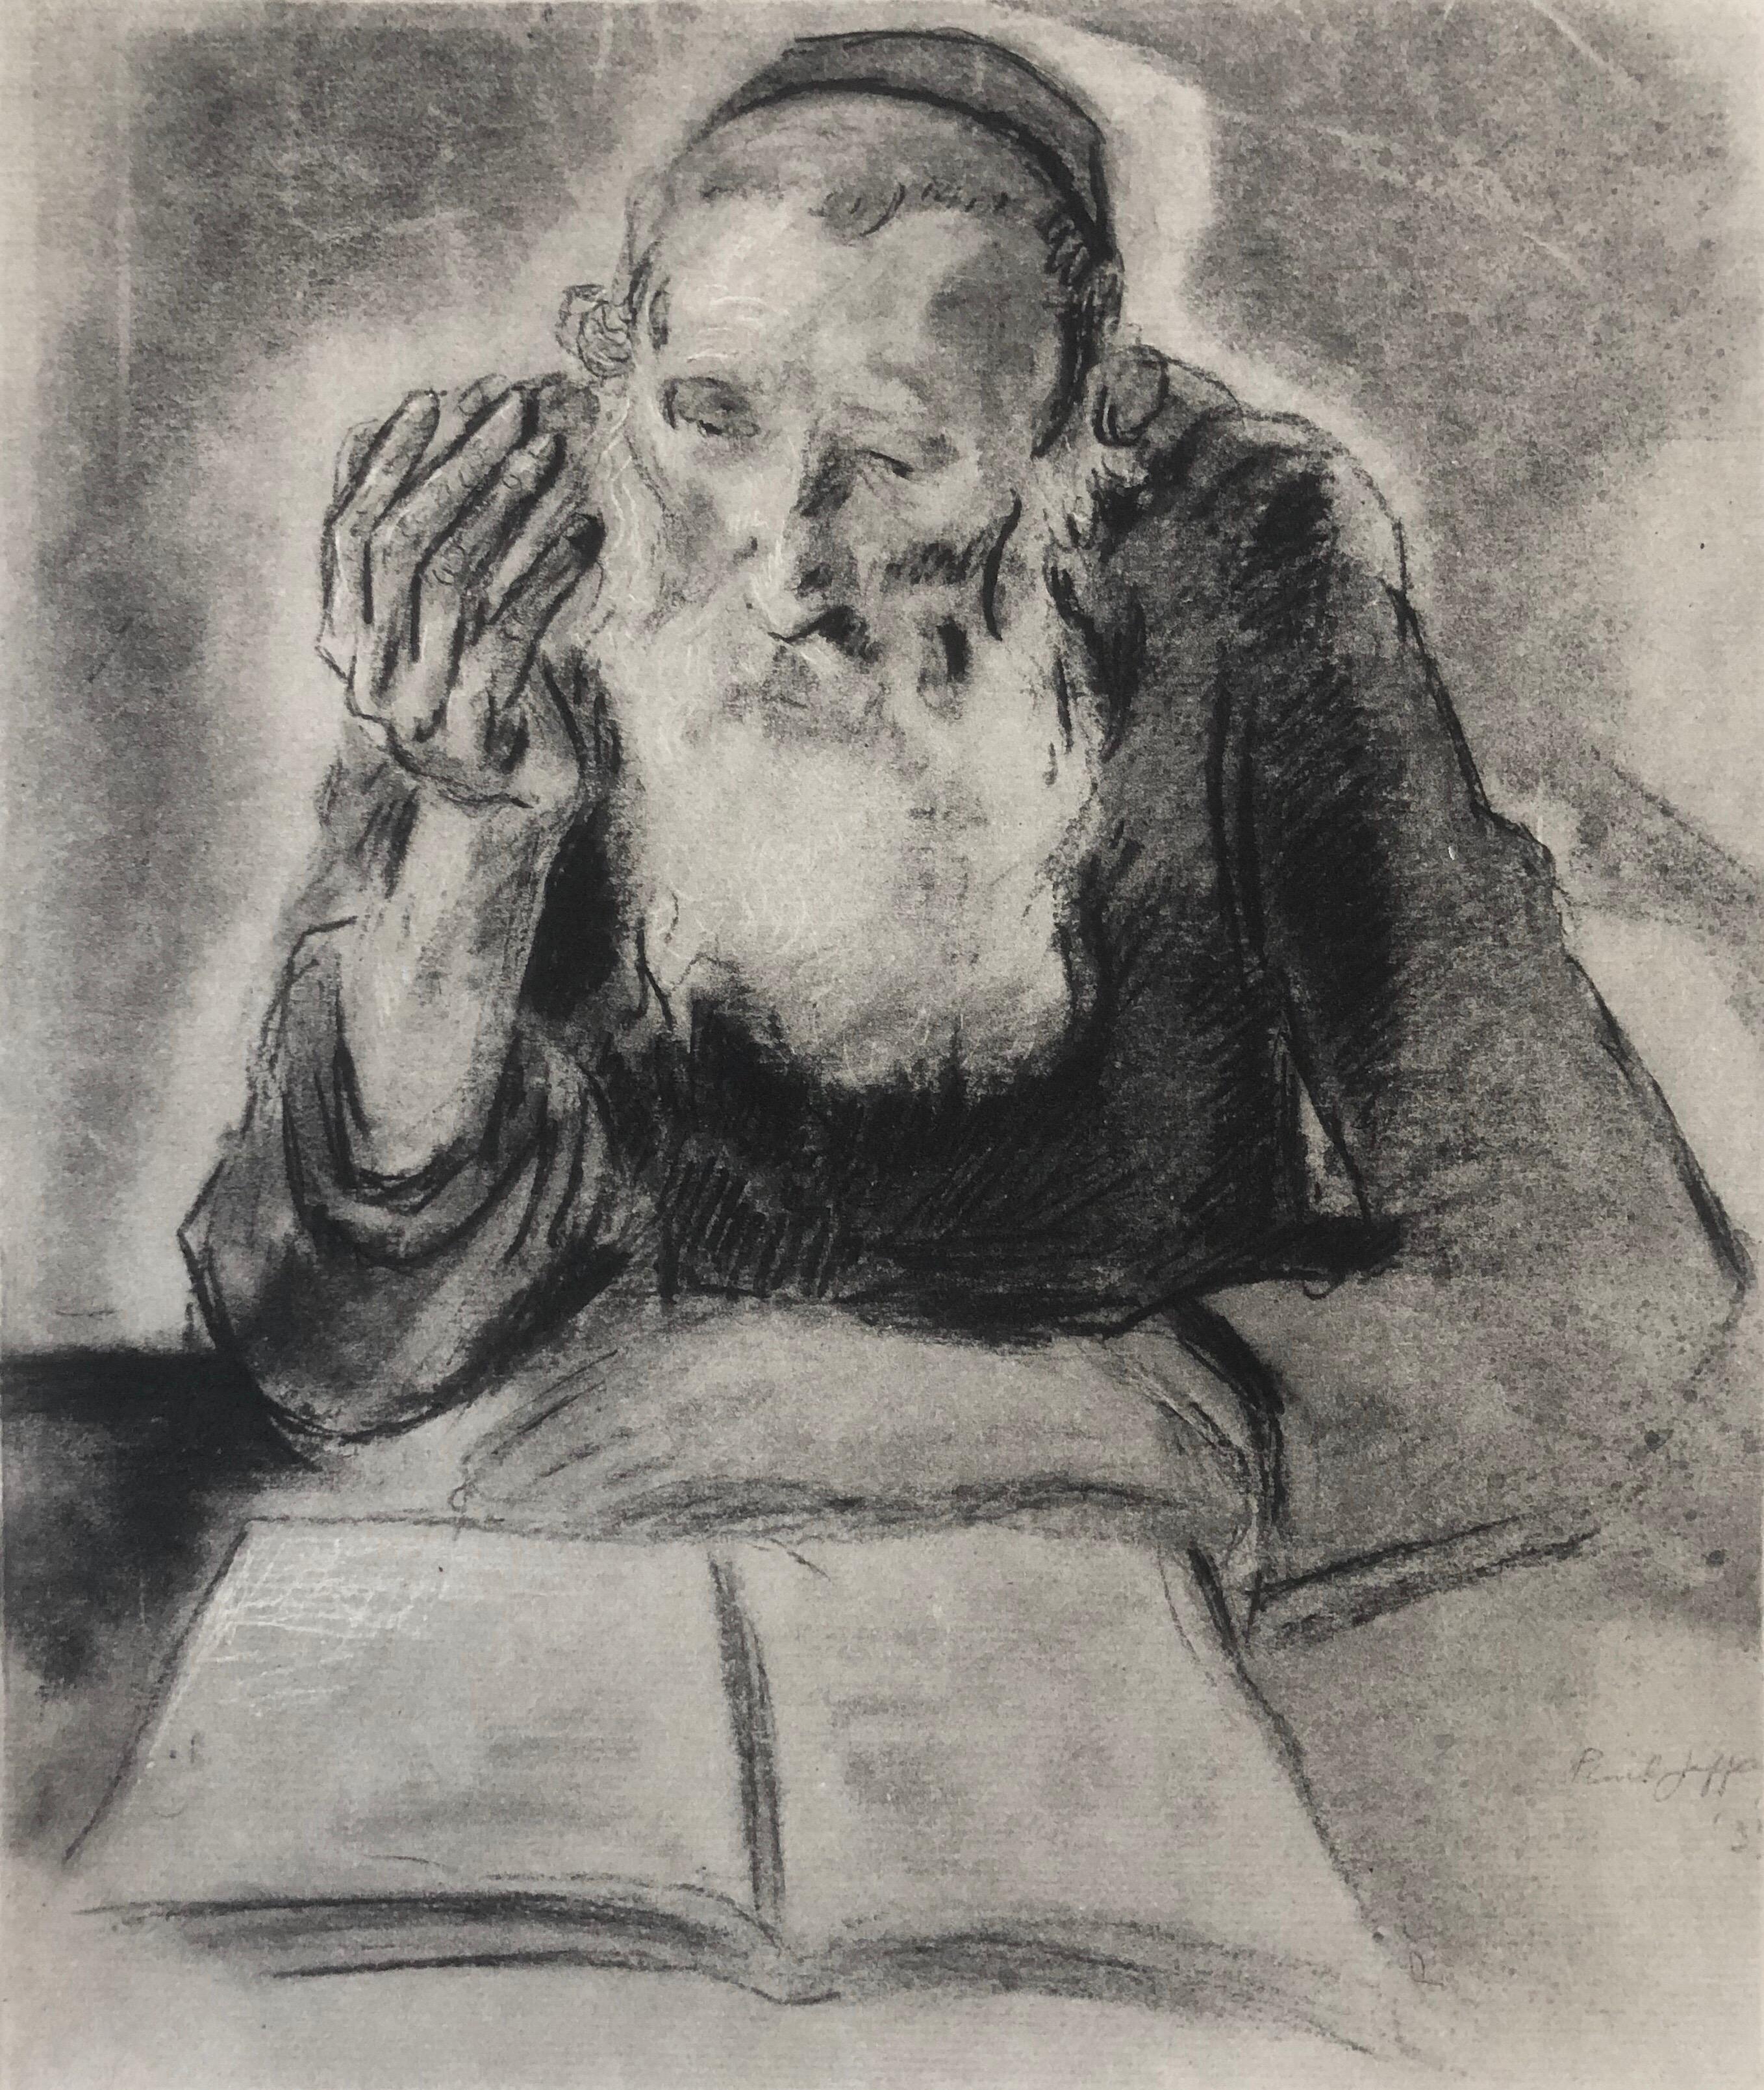 Judaica Jewish Shtetl Etching Hasidic Rabbi at Study Vintage Chassidic Print